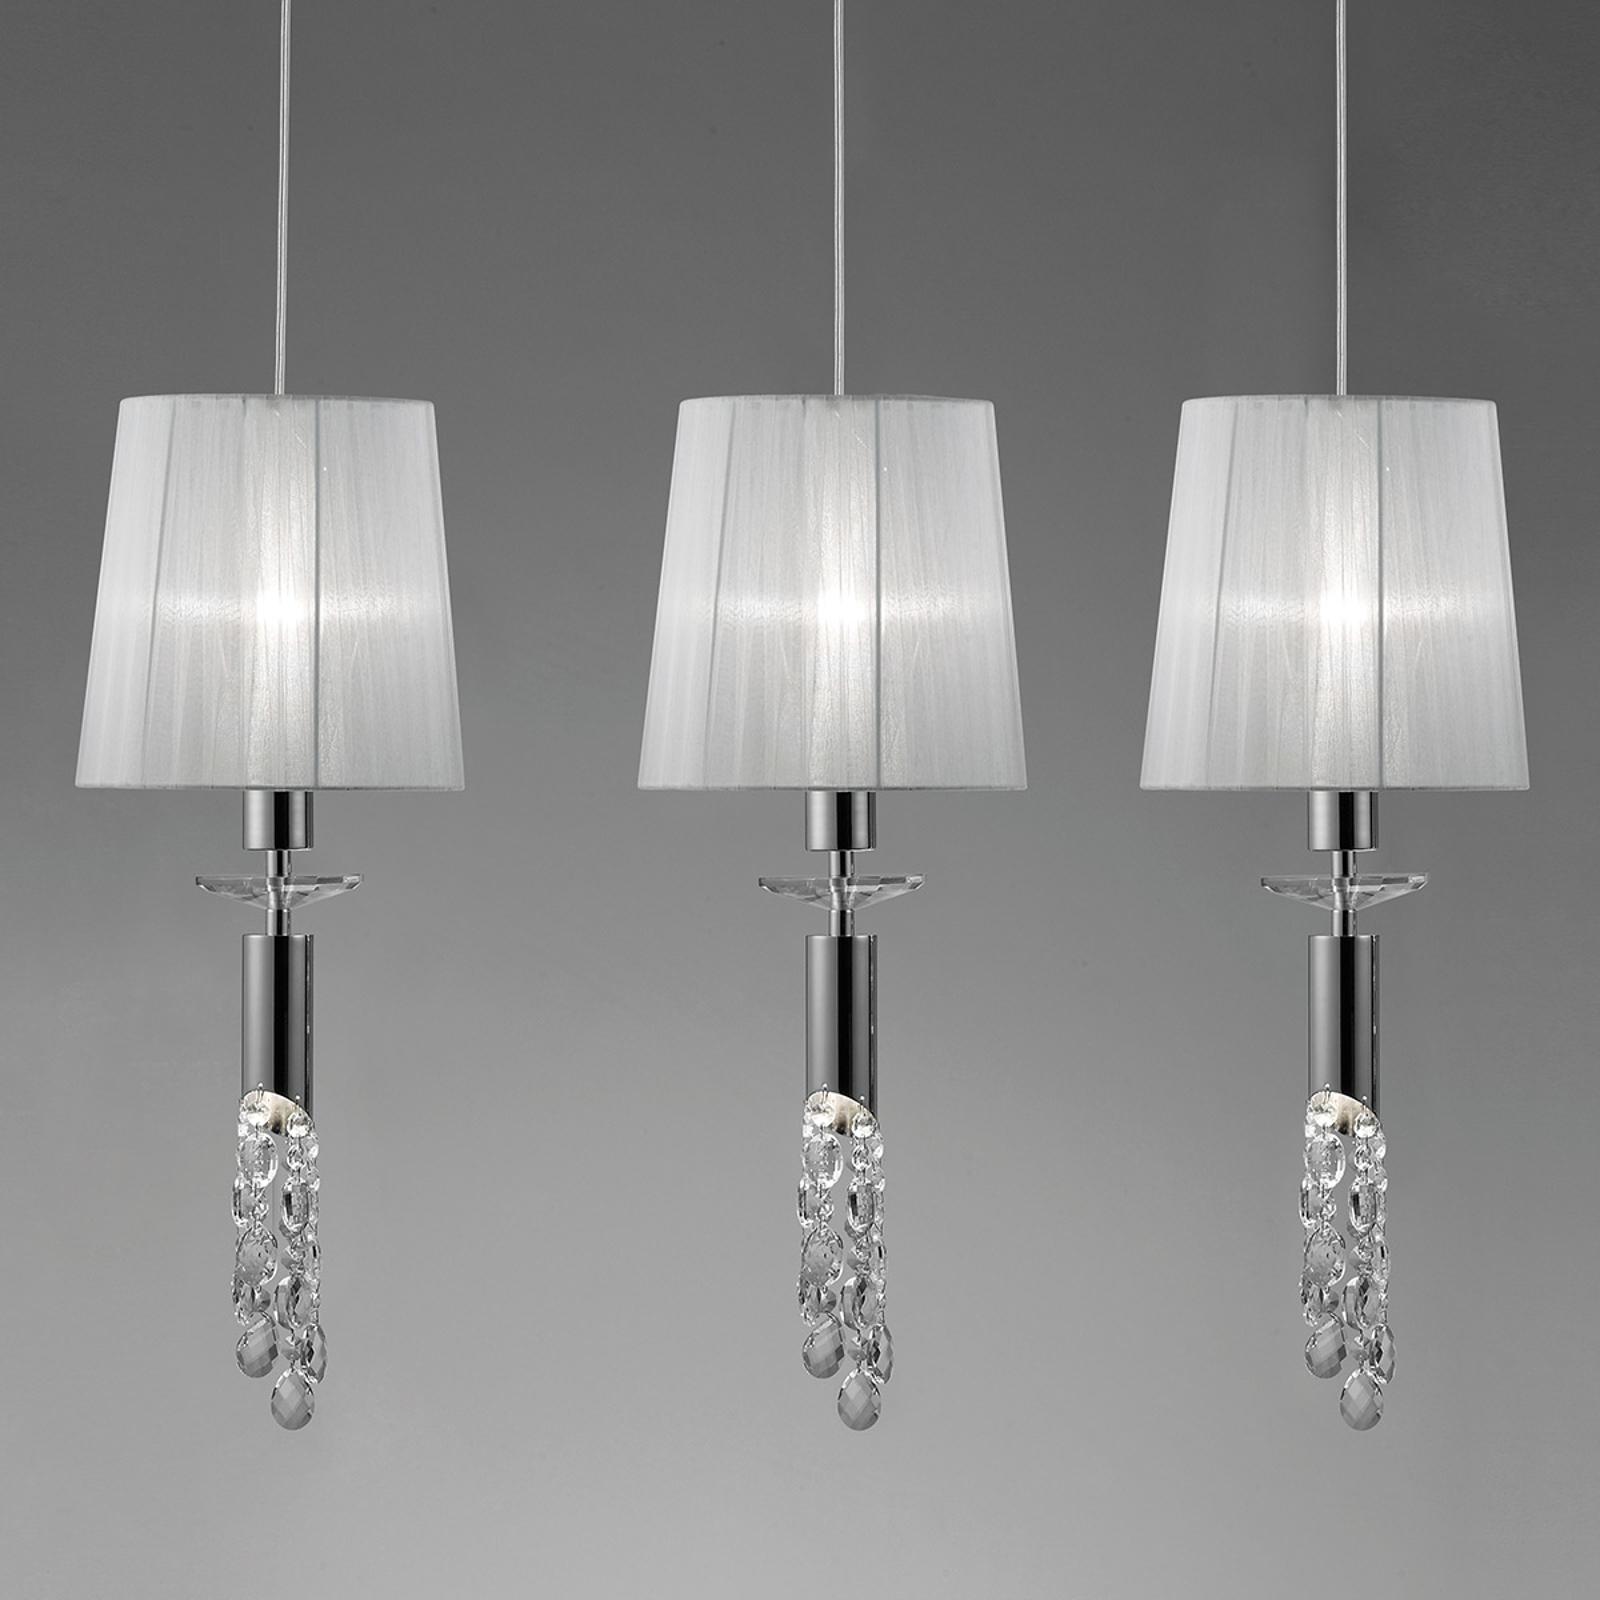 Striking 3-bulb pendant light Lilja with crystals_6542277_1